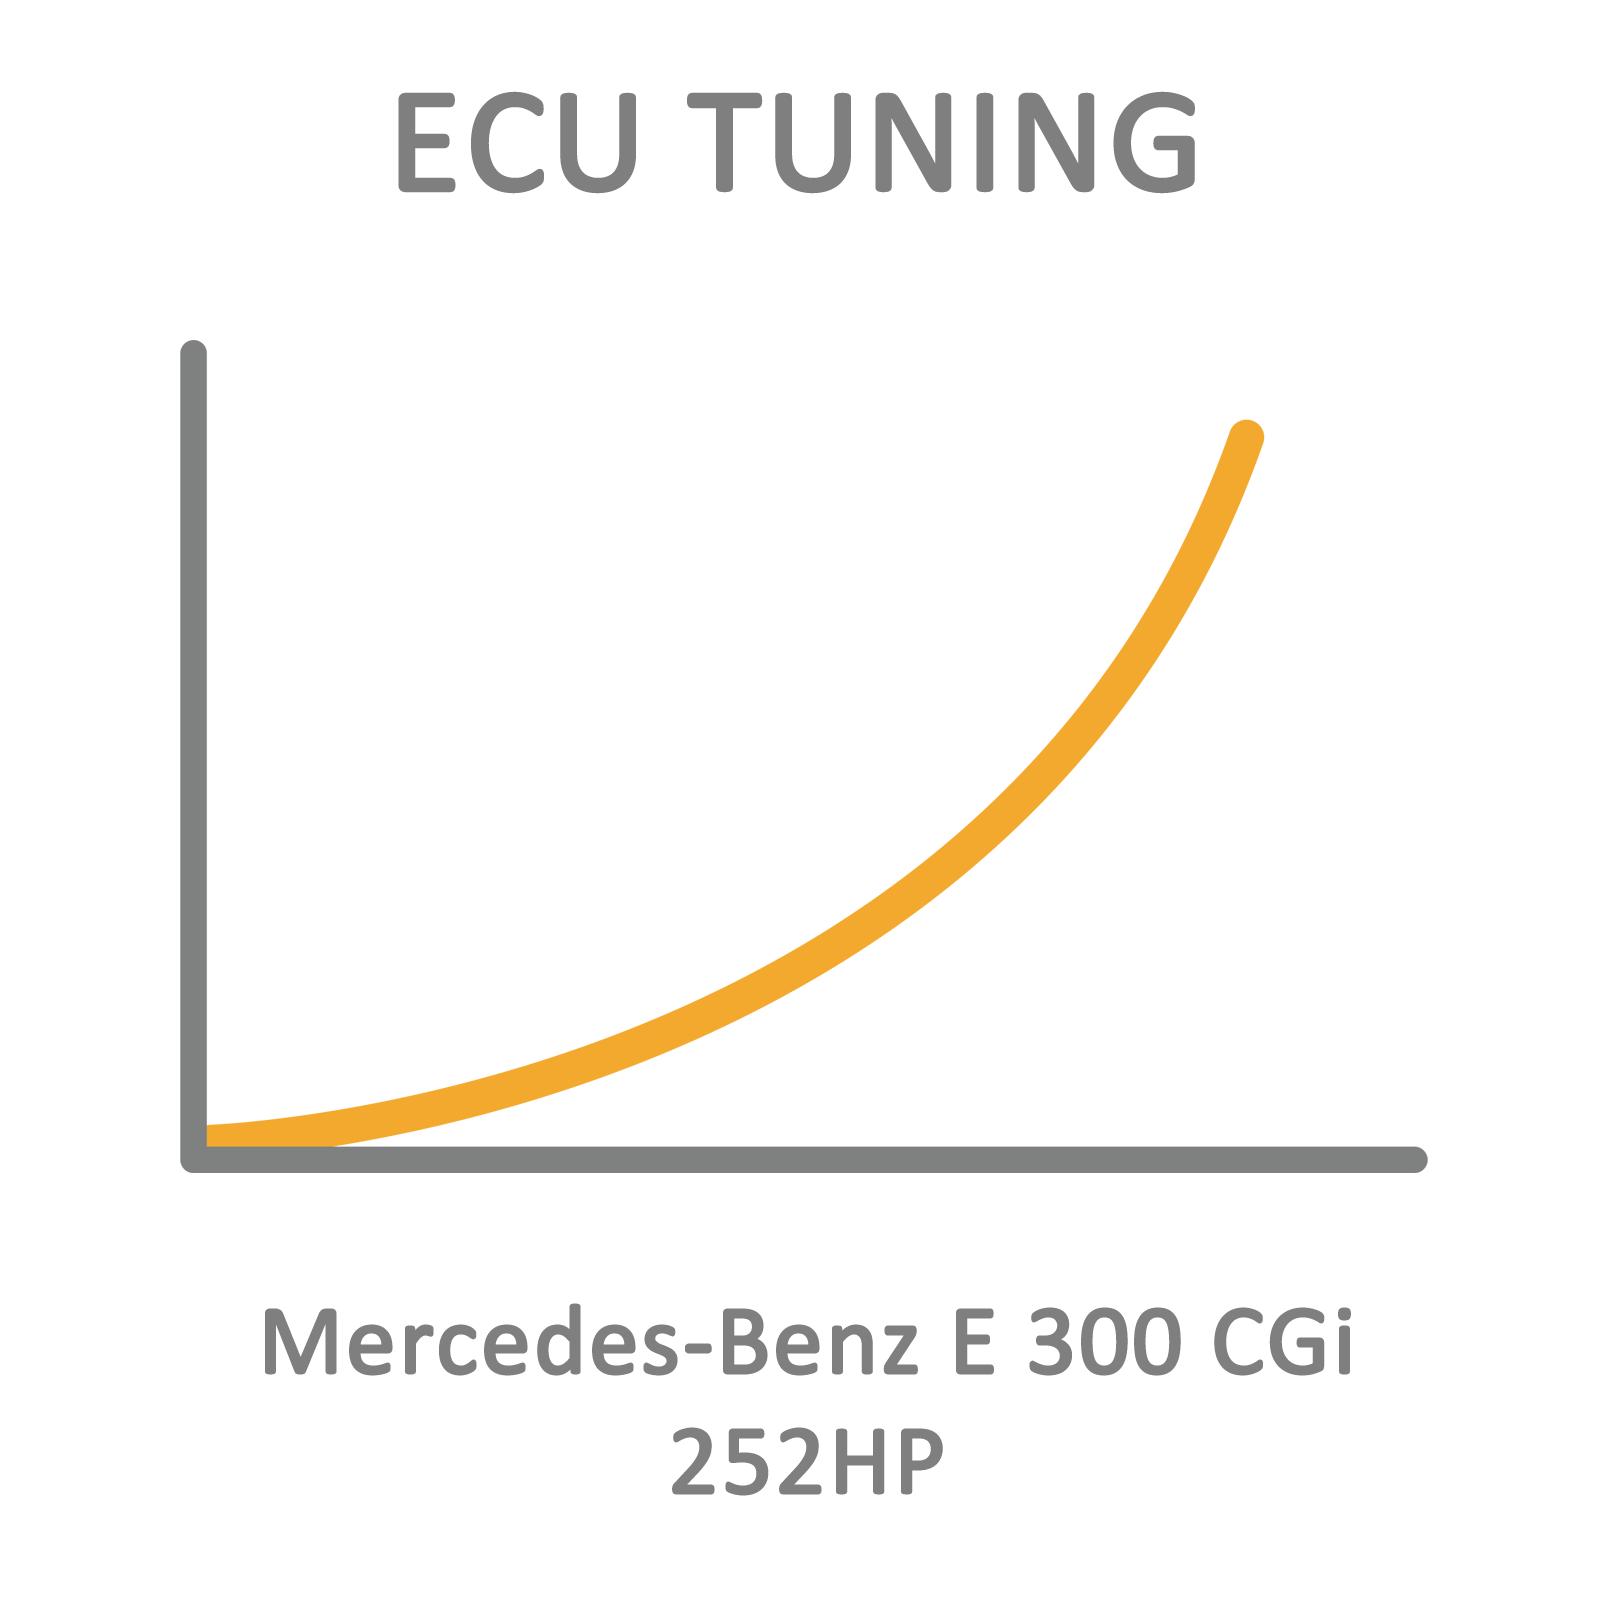 Mercedes-Benz E 300 CGi 252HP ECU Tuning Remapping Programming